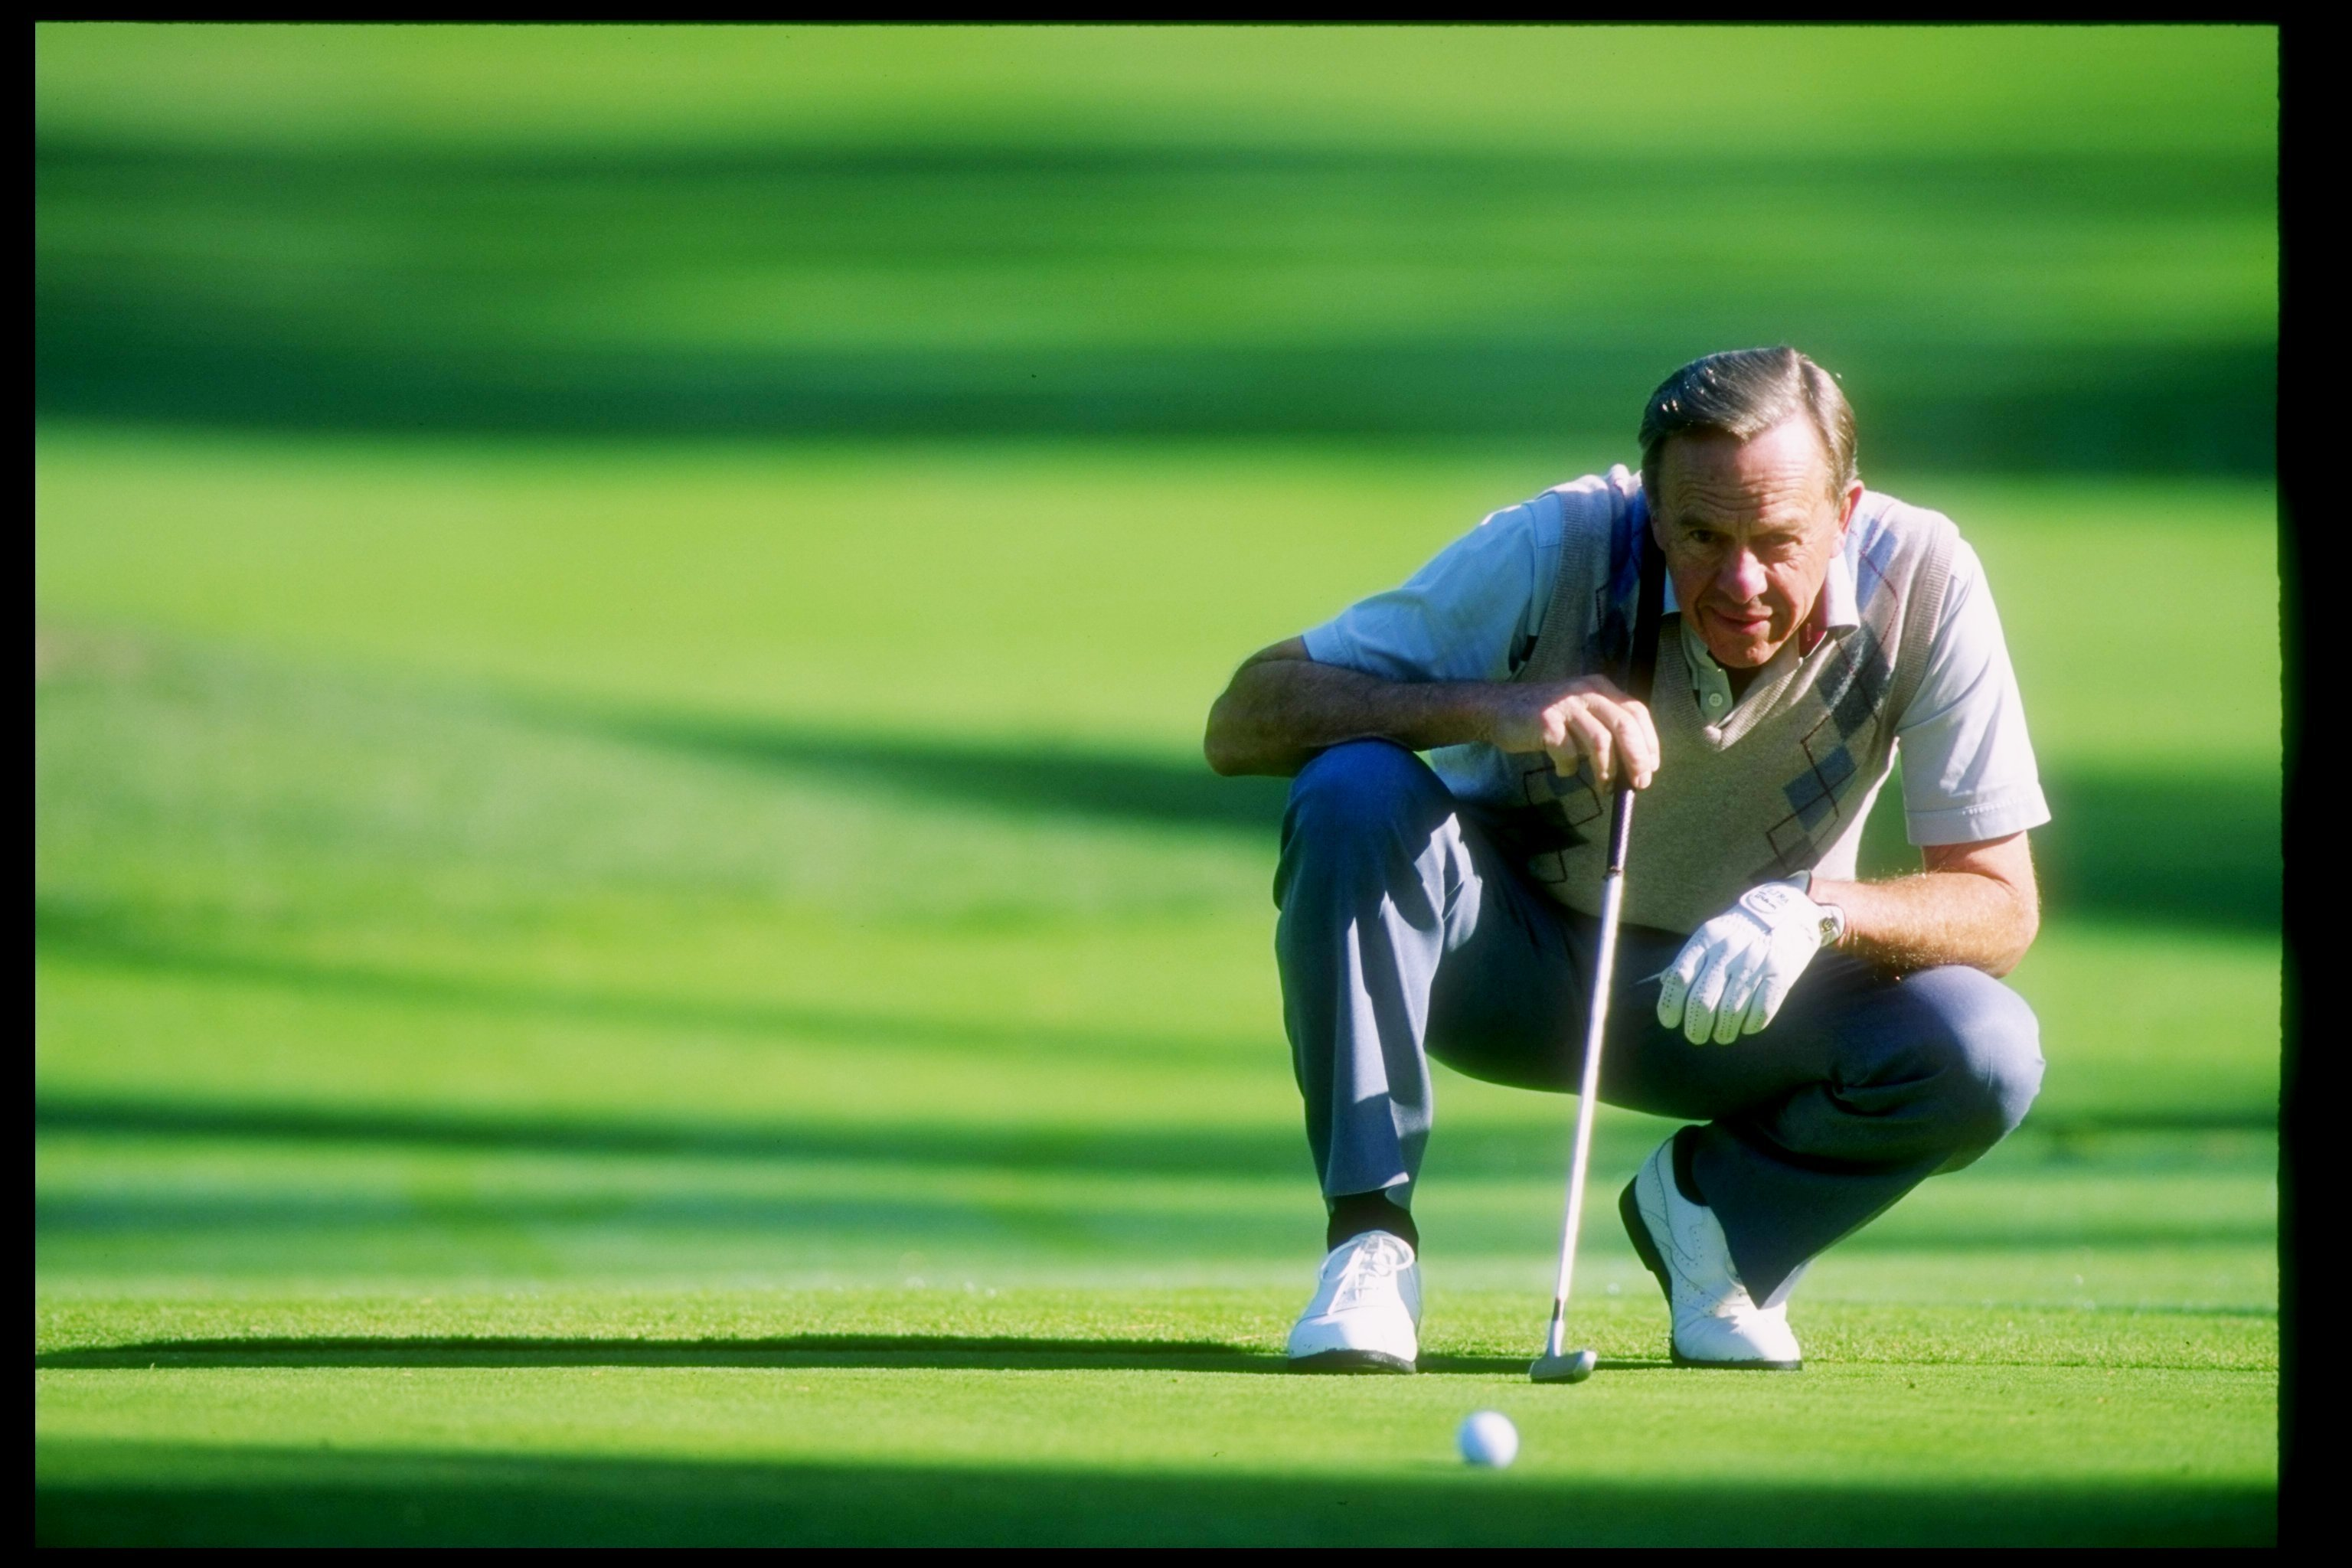 Former NASA astronaut Alan Shephard lines up a shot during a golfing event.